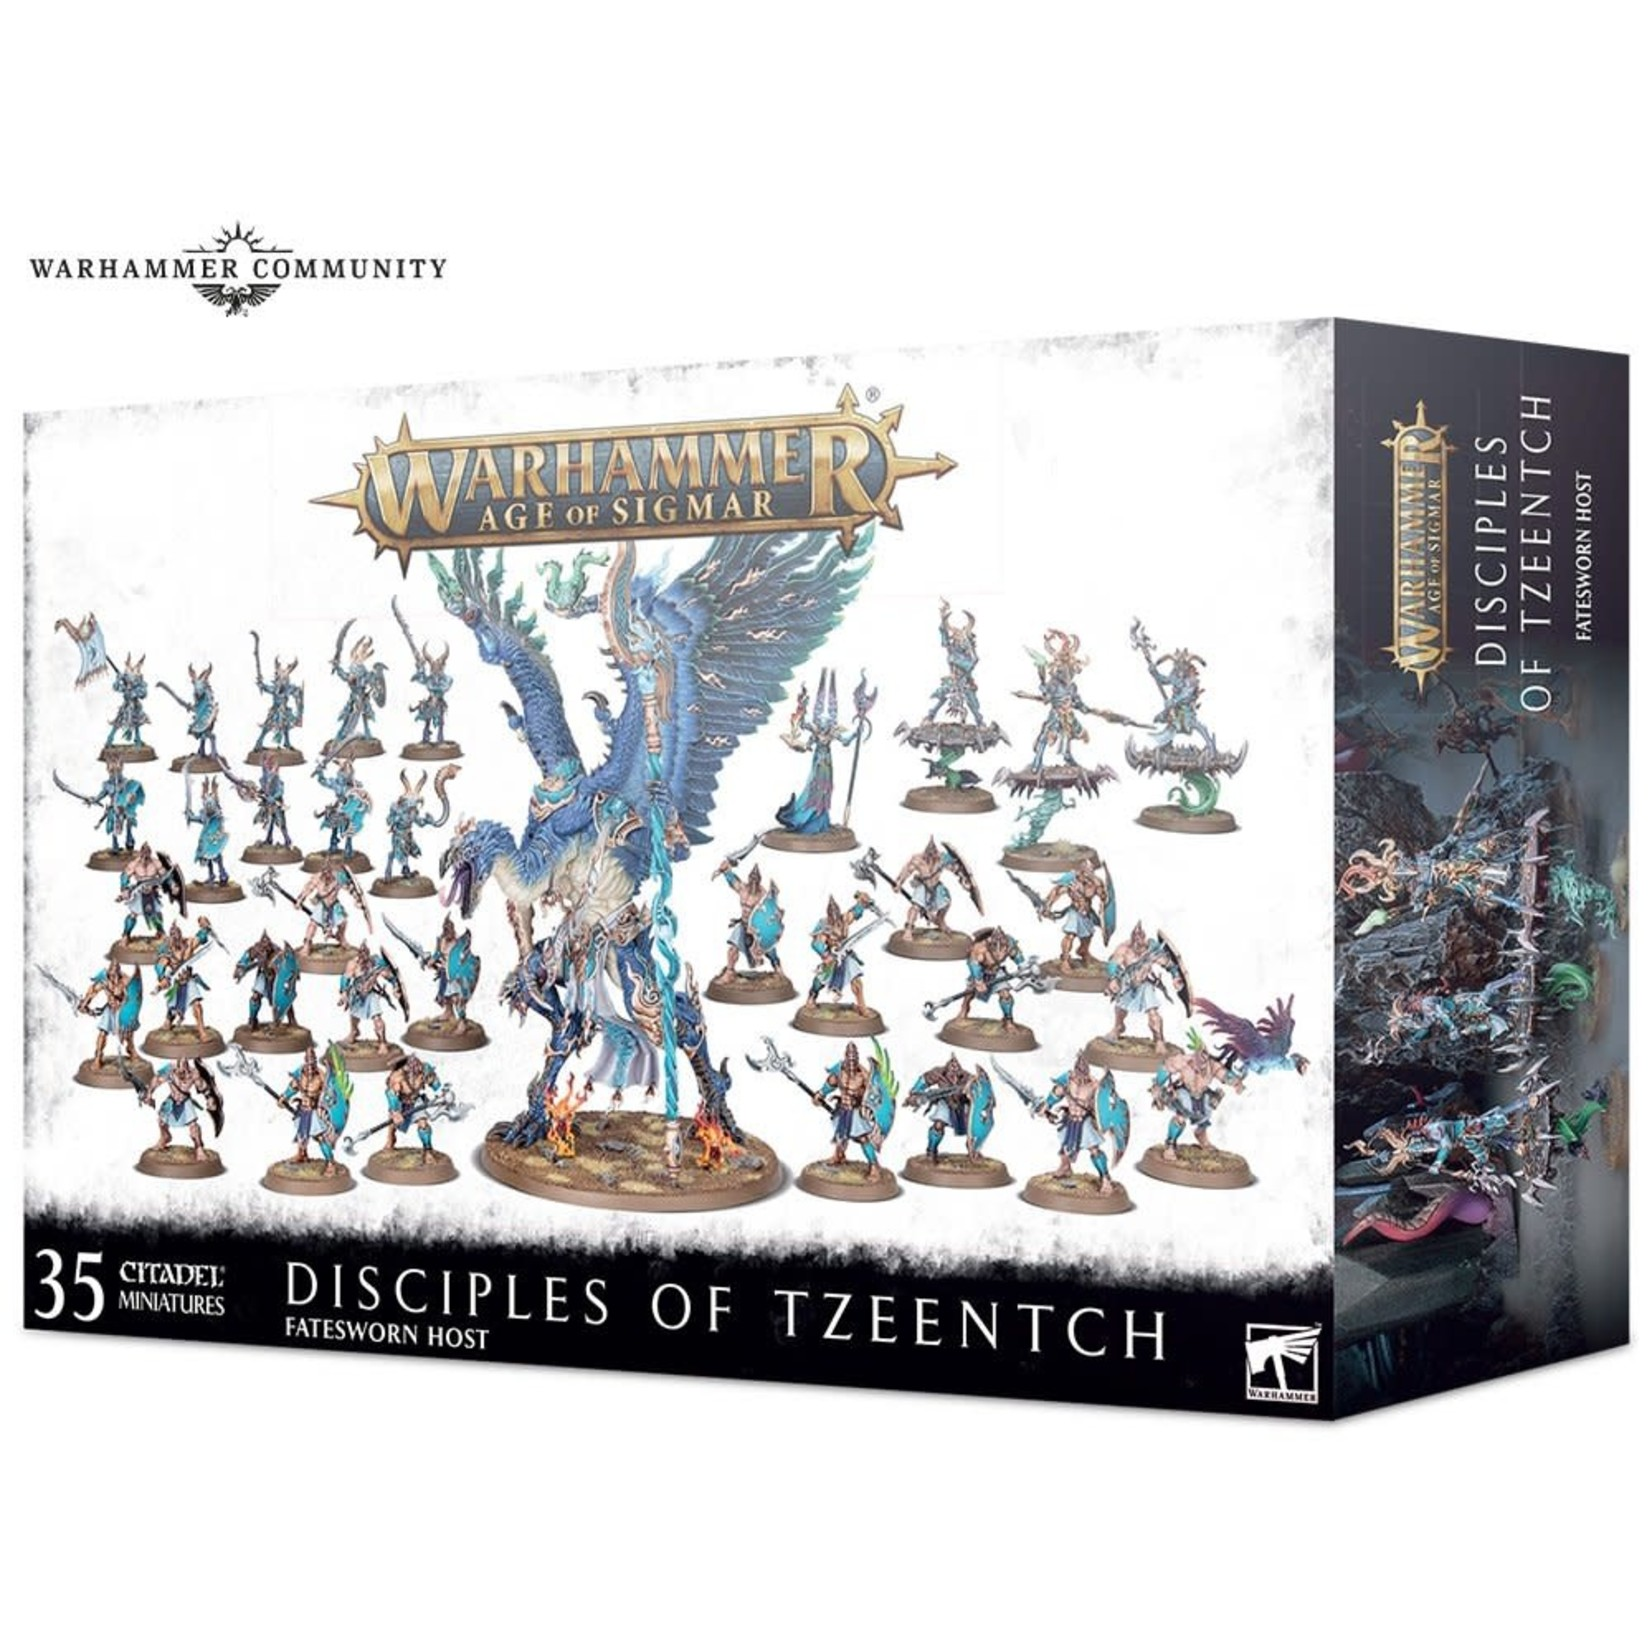 Games Workshop Warhammer Age of Sigmar: Disciples of Tzeentch Battleforce - Fatesworn Host